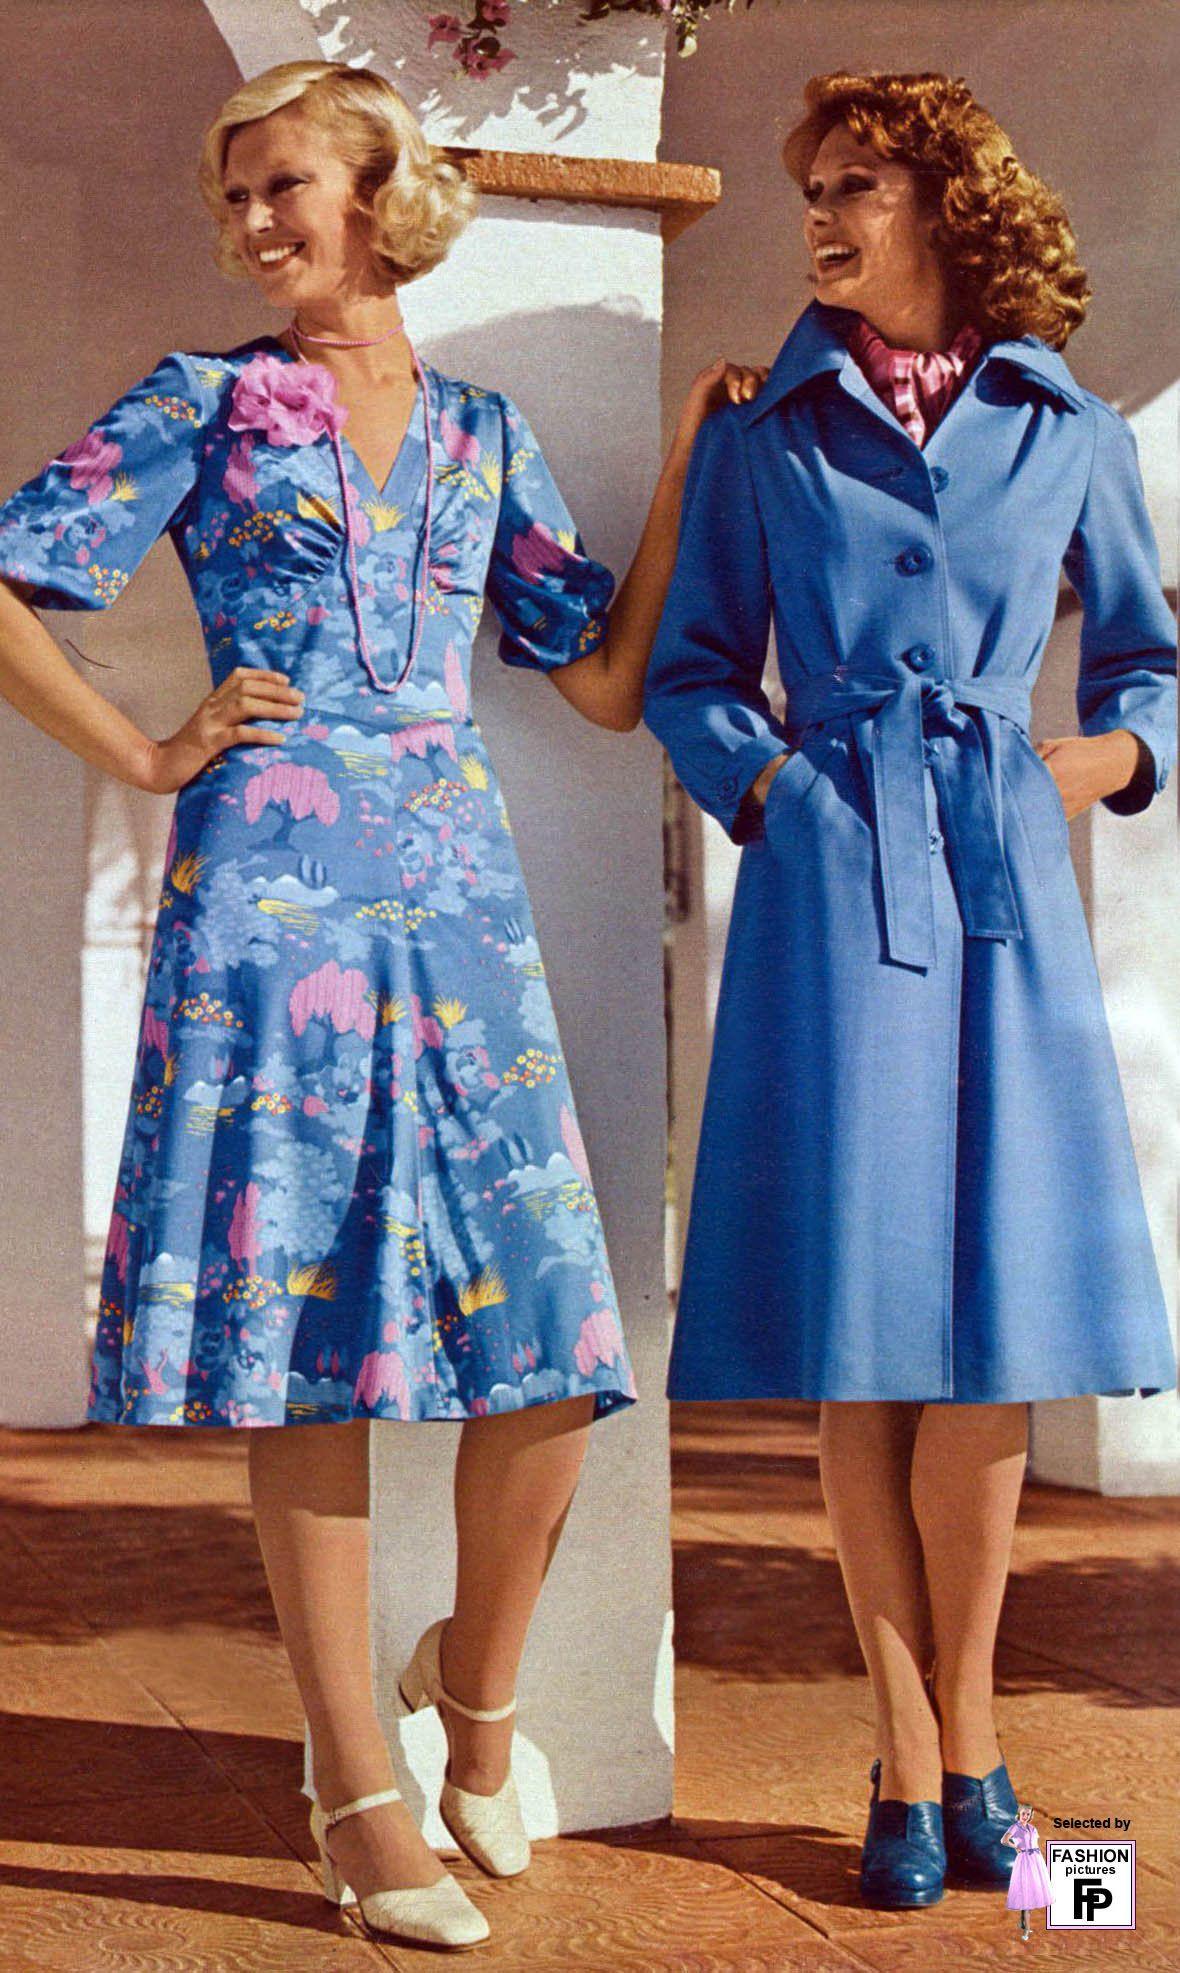 fashion neg us fashion pinterest s